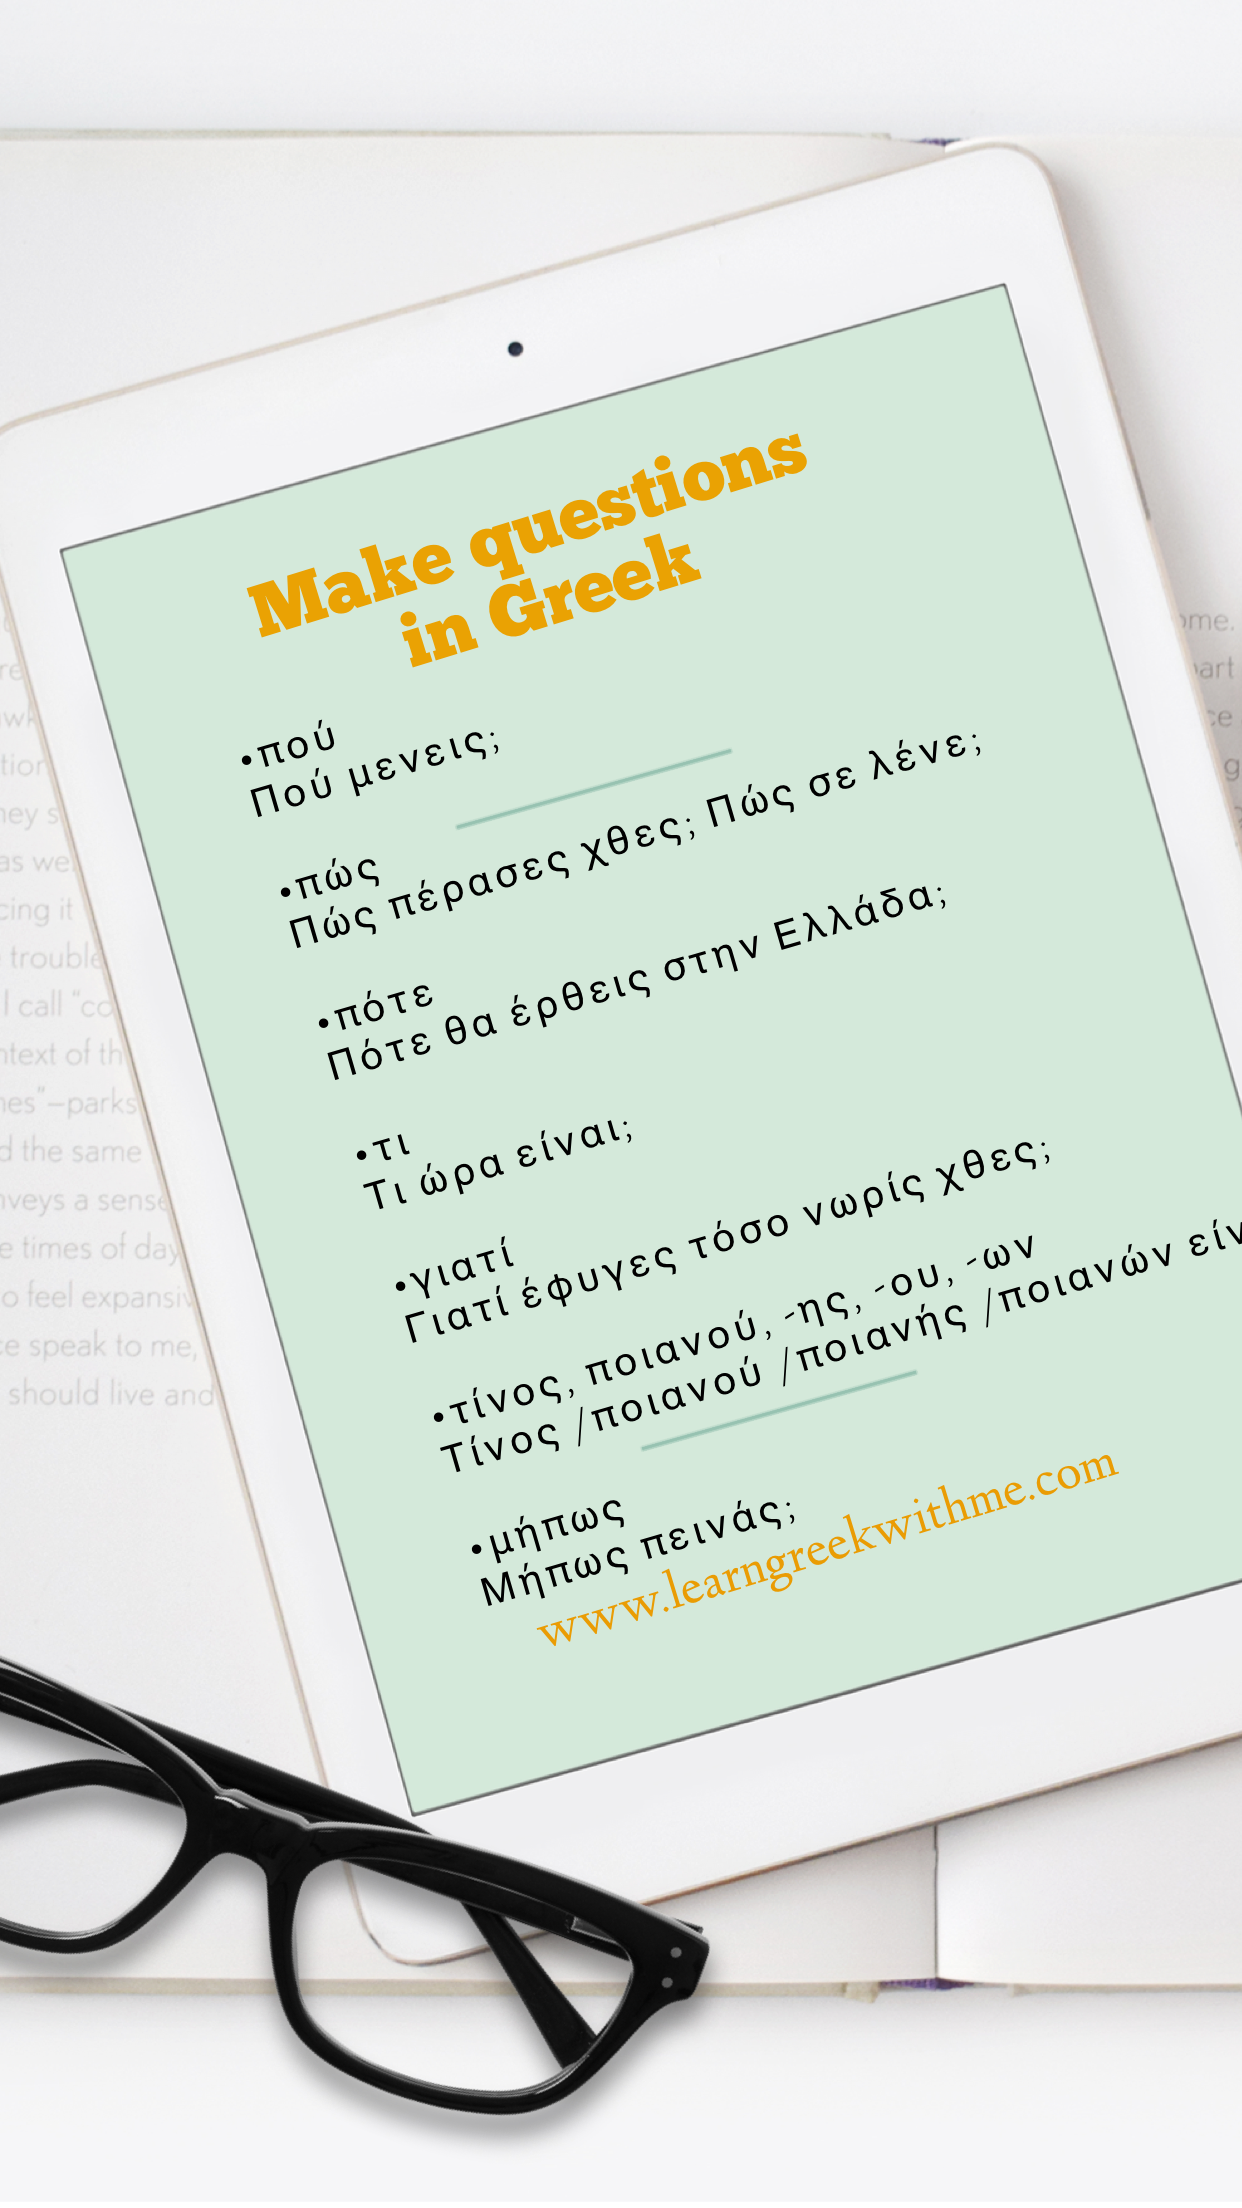 Make questions in Greek